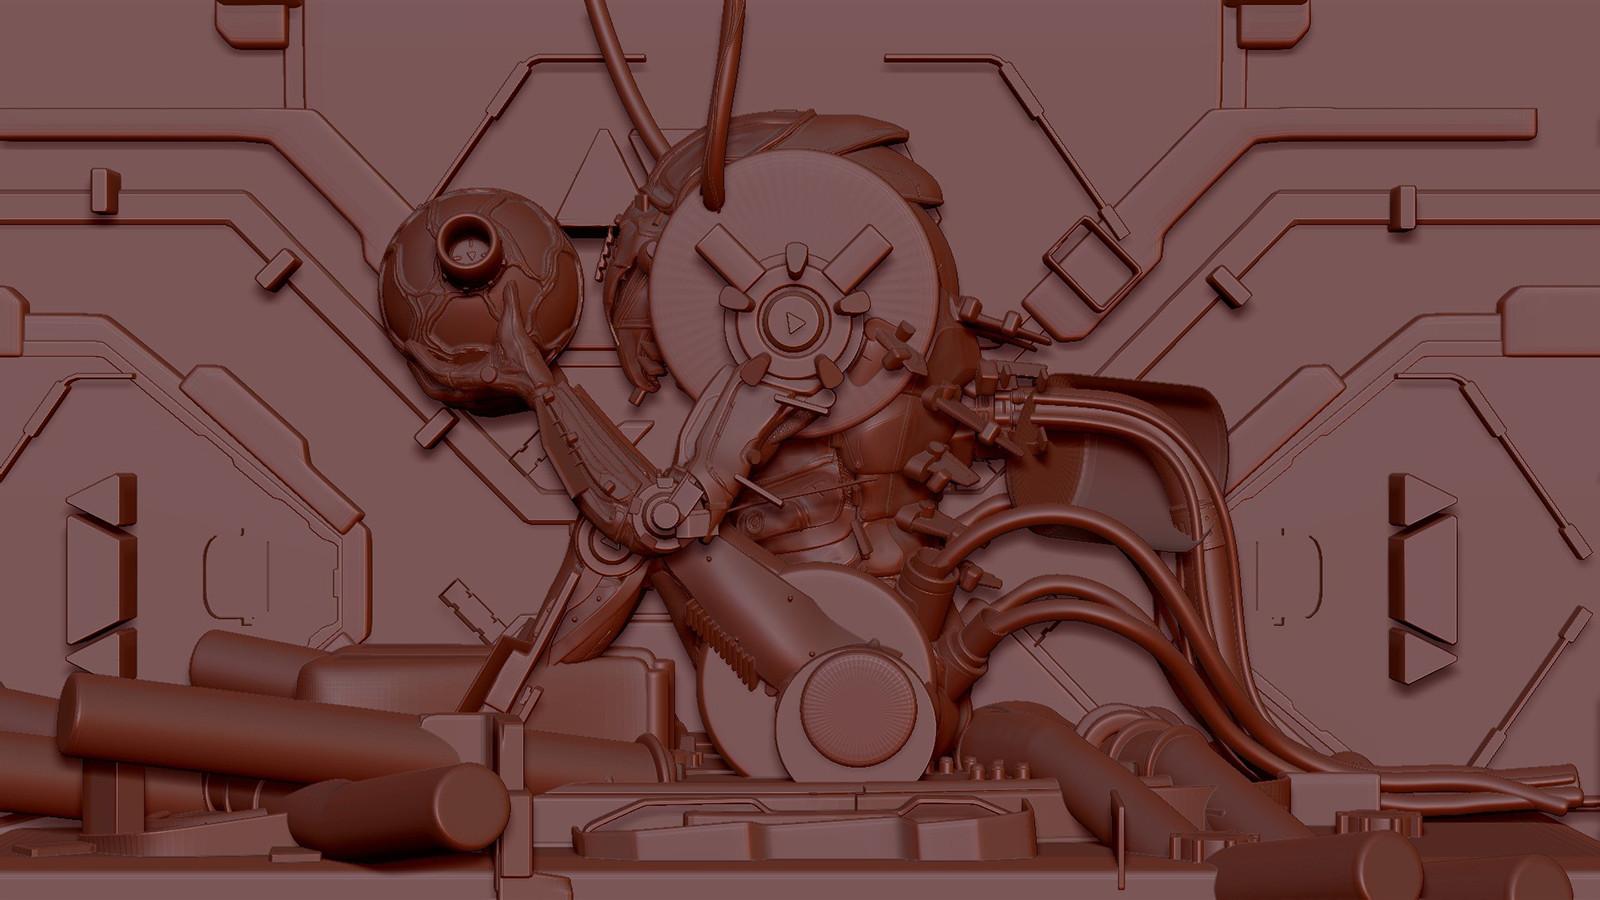 Chozo Metroid Zbrush Booleans